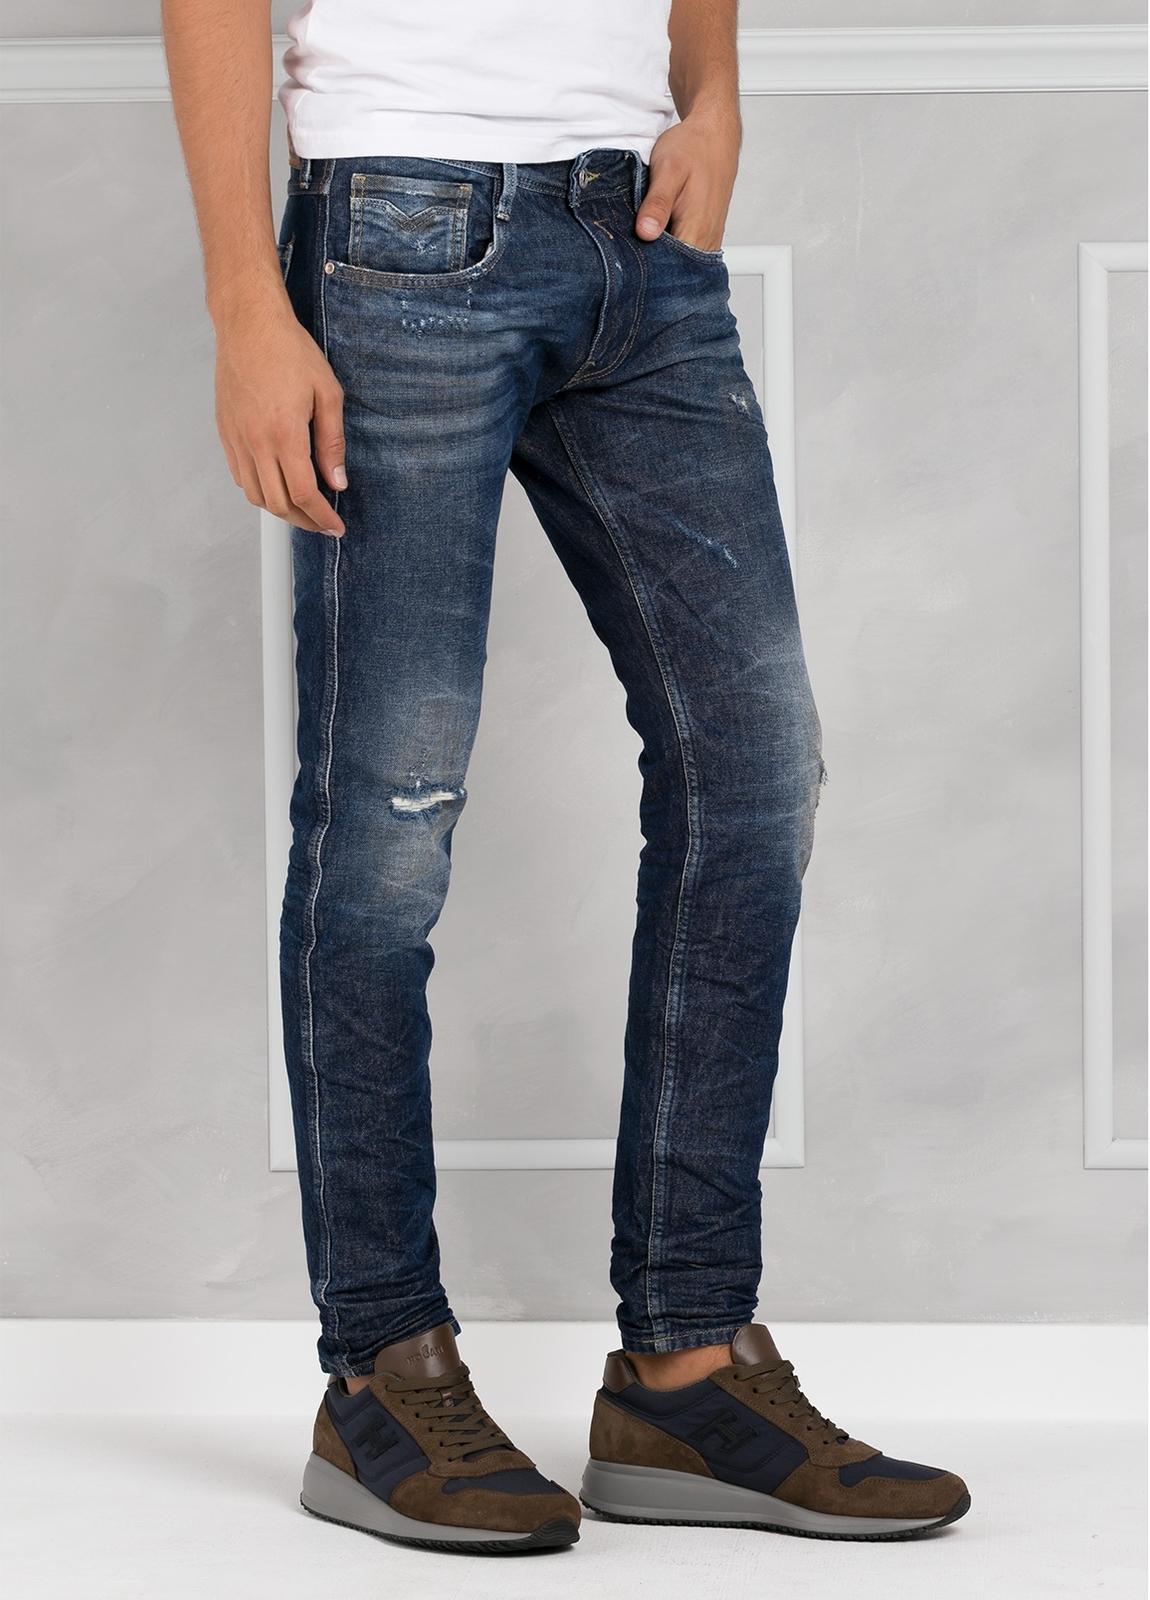 Pantalón tejano 13 oz SLIM M914 AMBAS color azul medio lavado. 99% Algodón 1% Elastán. - Ítem3